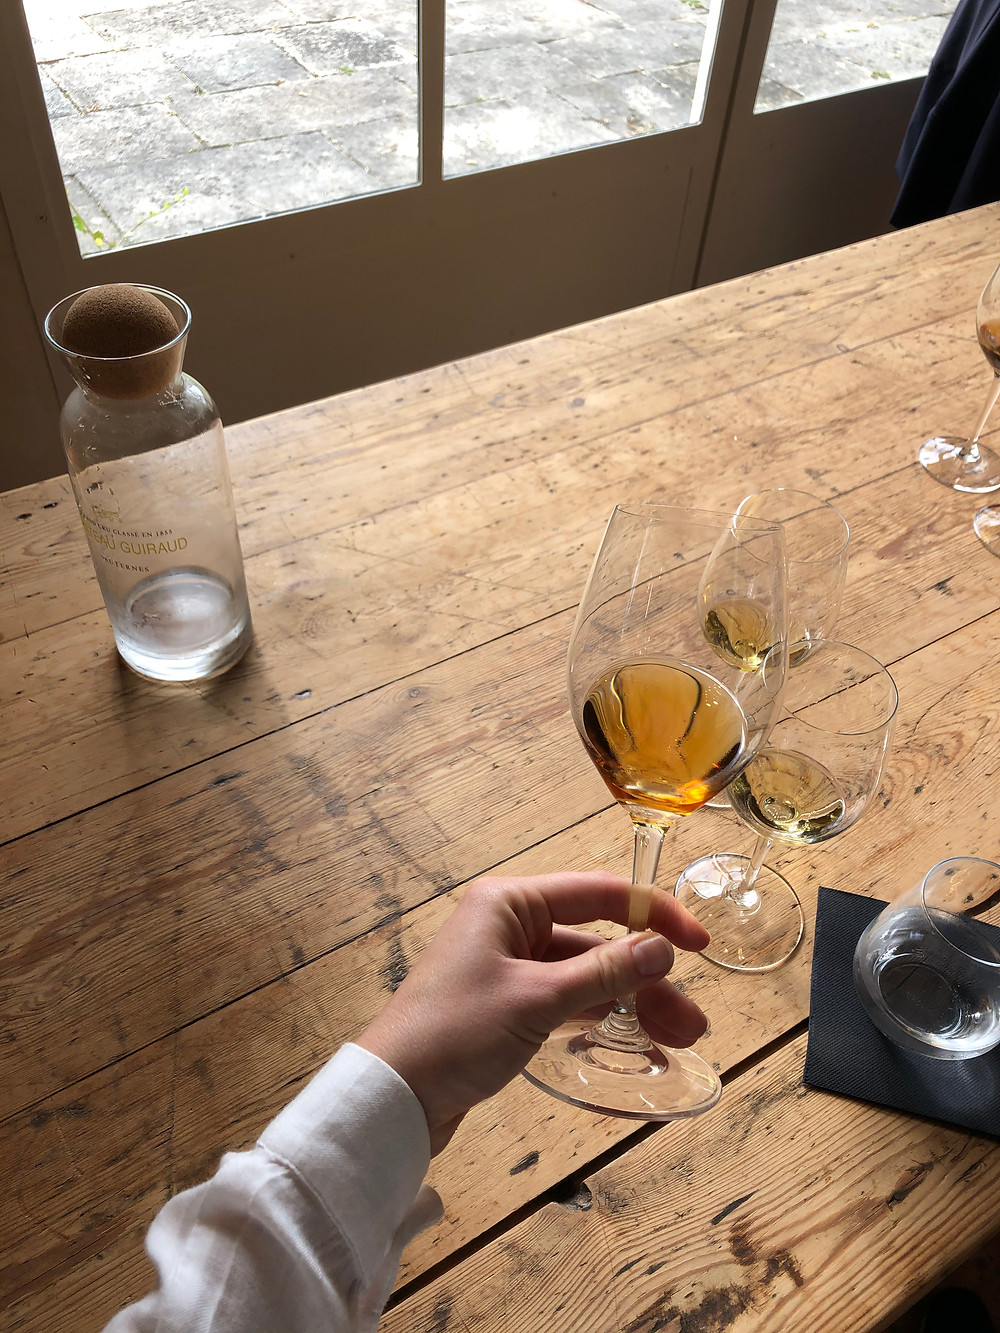 Vertical wine tasting Sauternes wine vintage tasting at Chateau Guiraud organic sweet wine producer